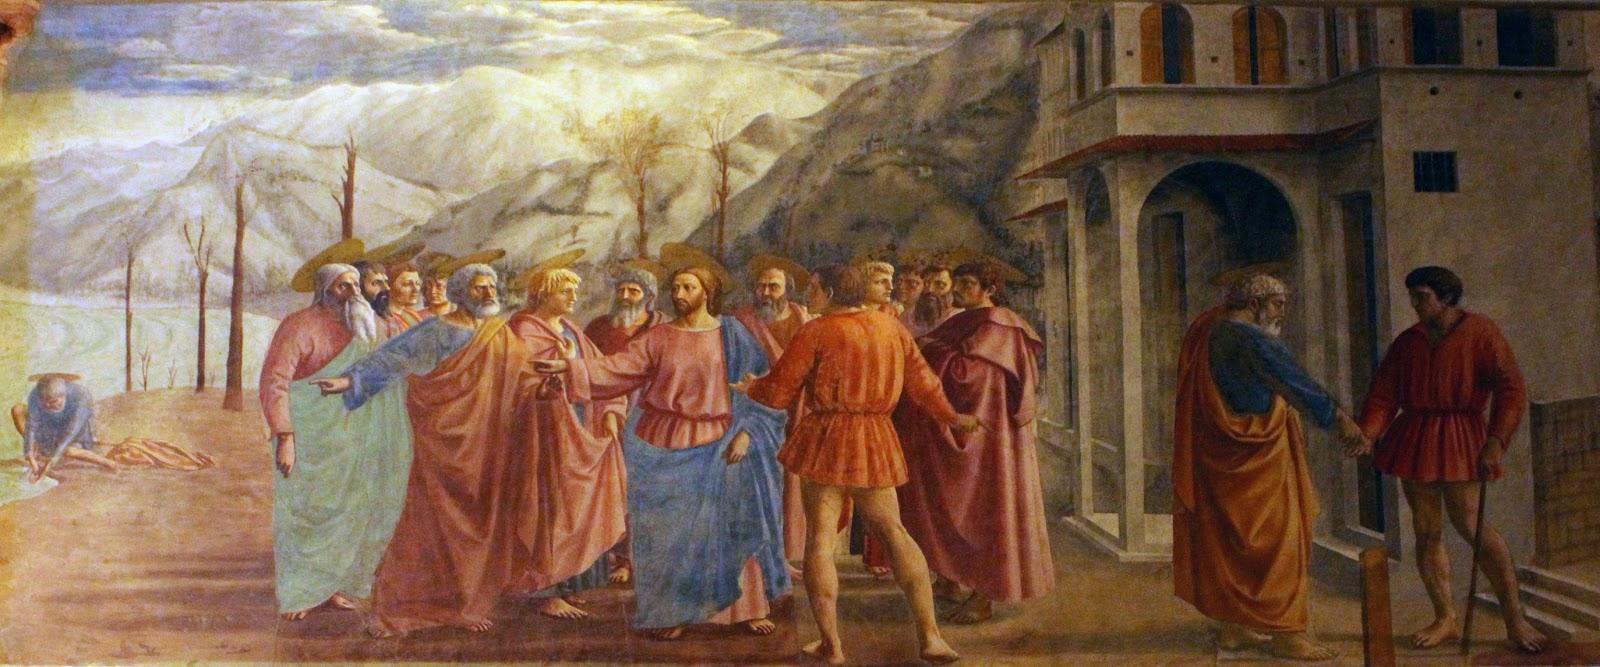 a biography of masaccio a historical figure